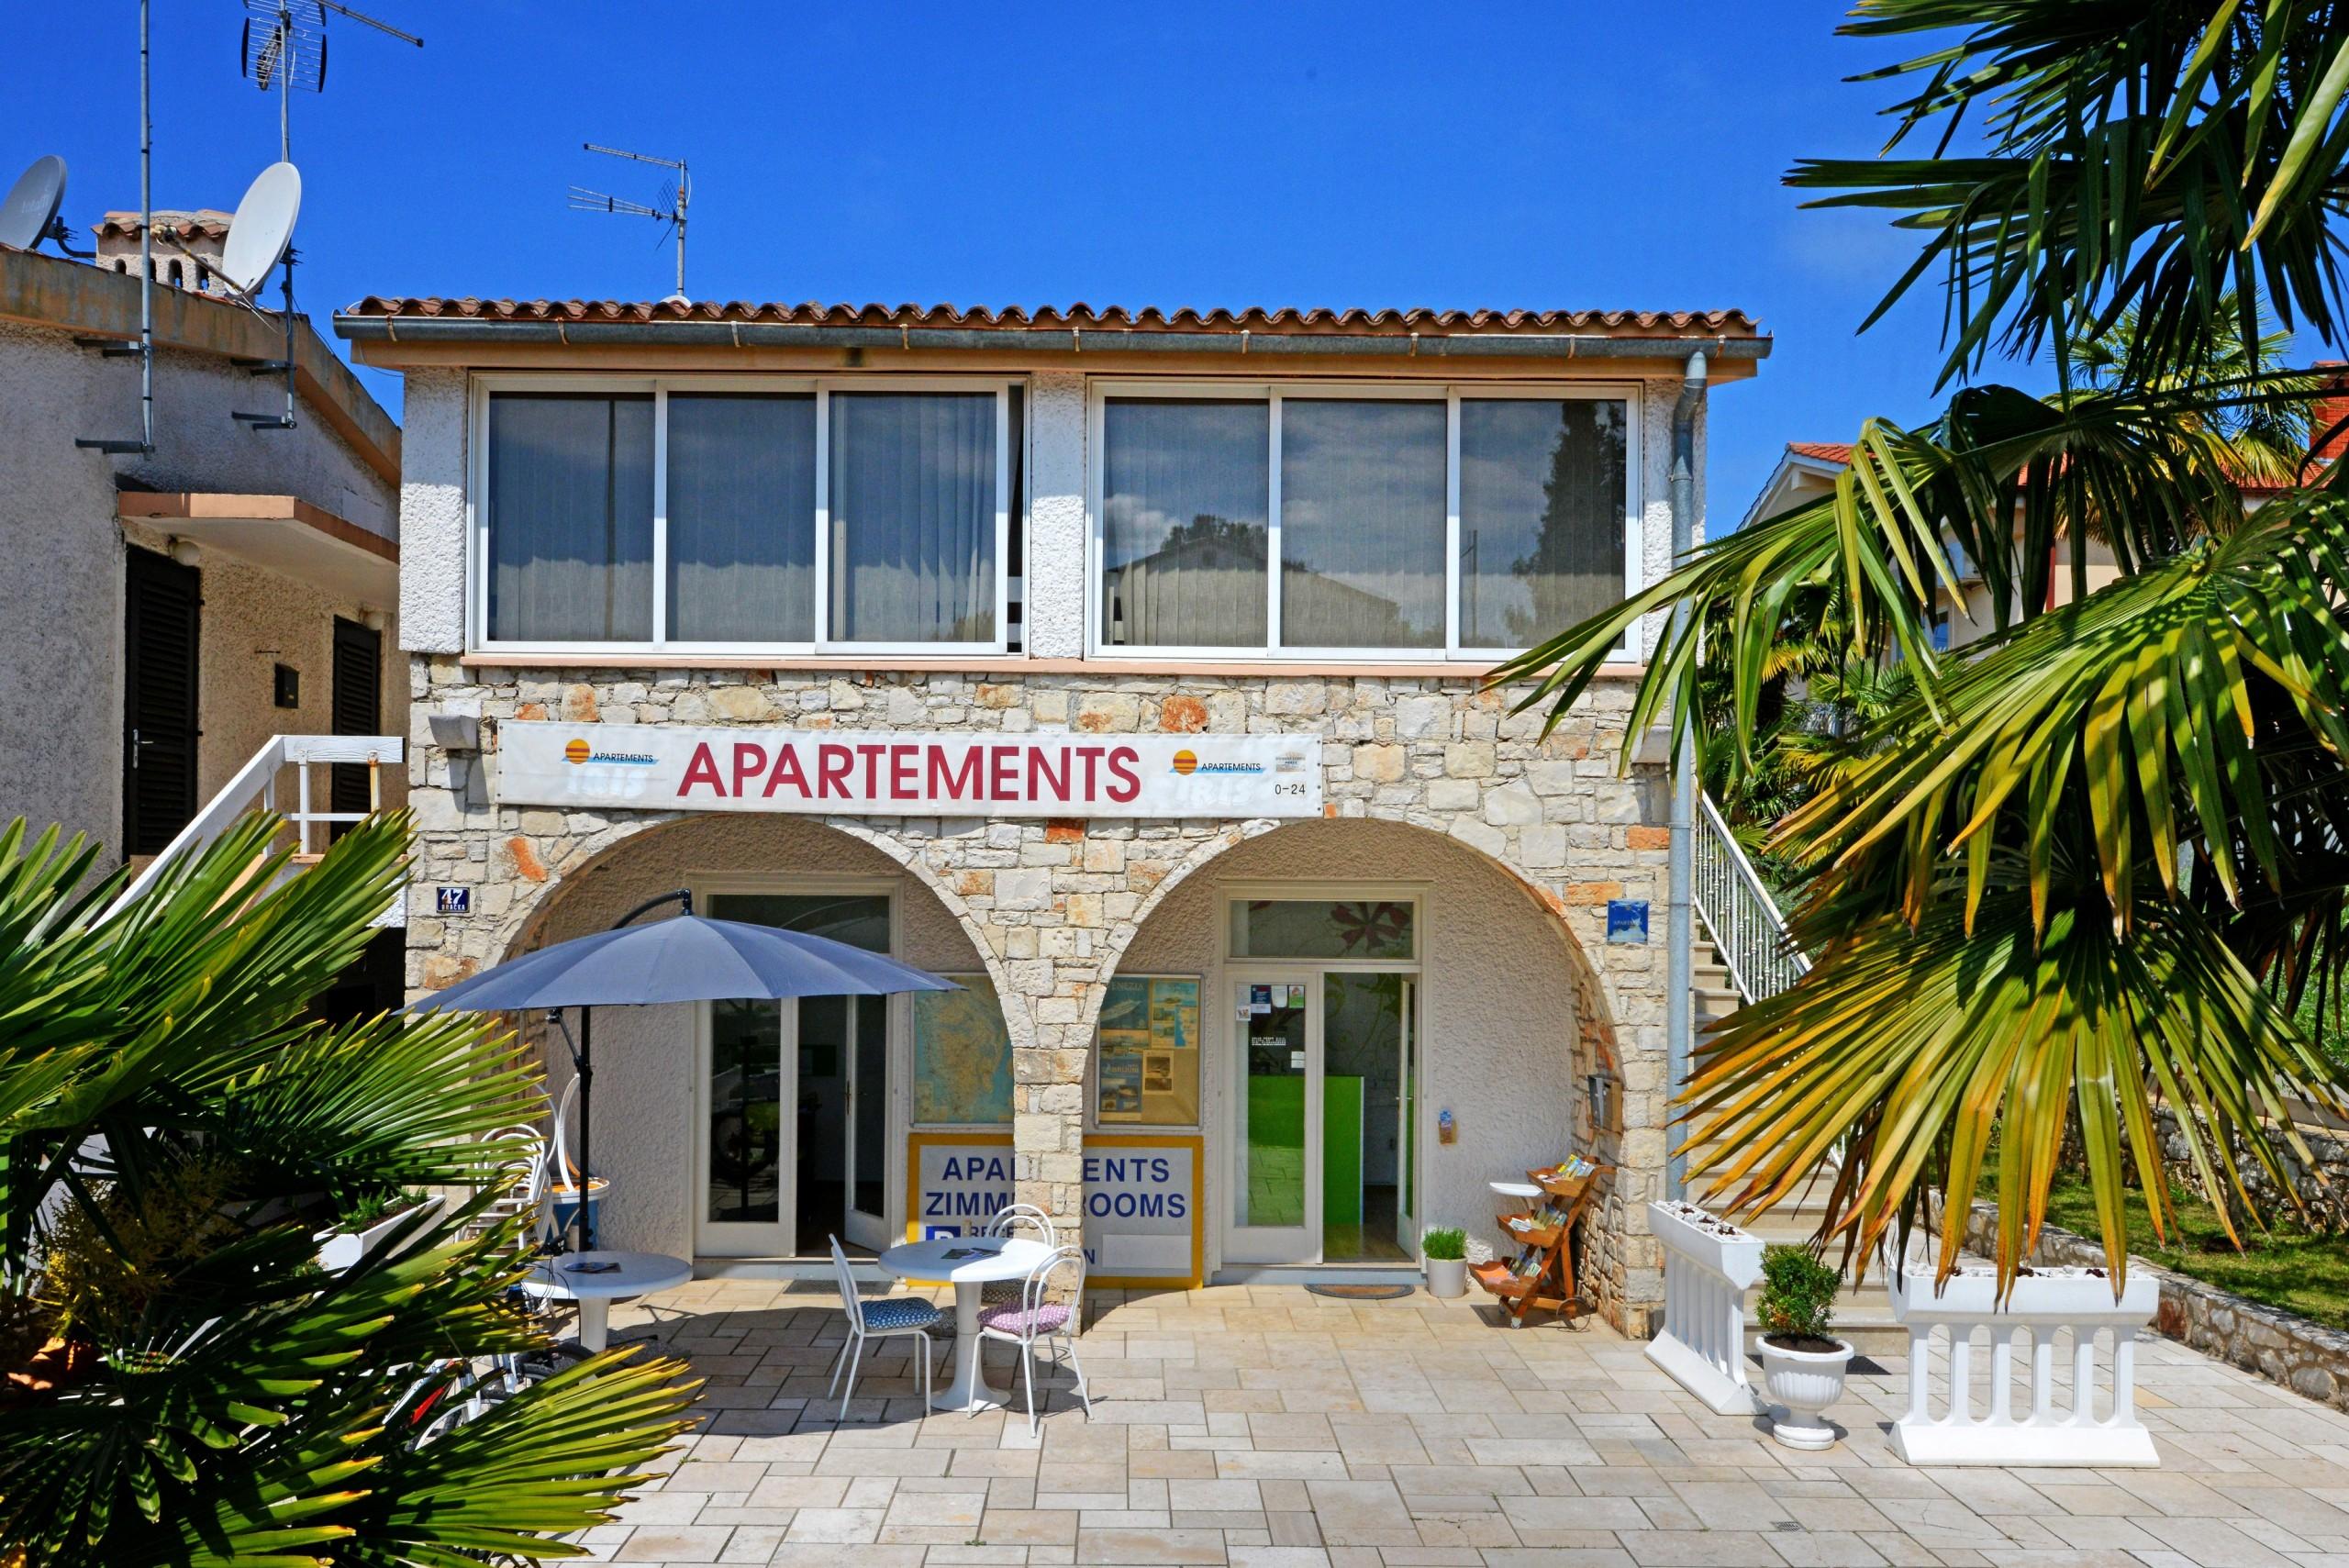 Appartamenti in porec apartment iris ii for Camere a porec